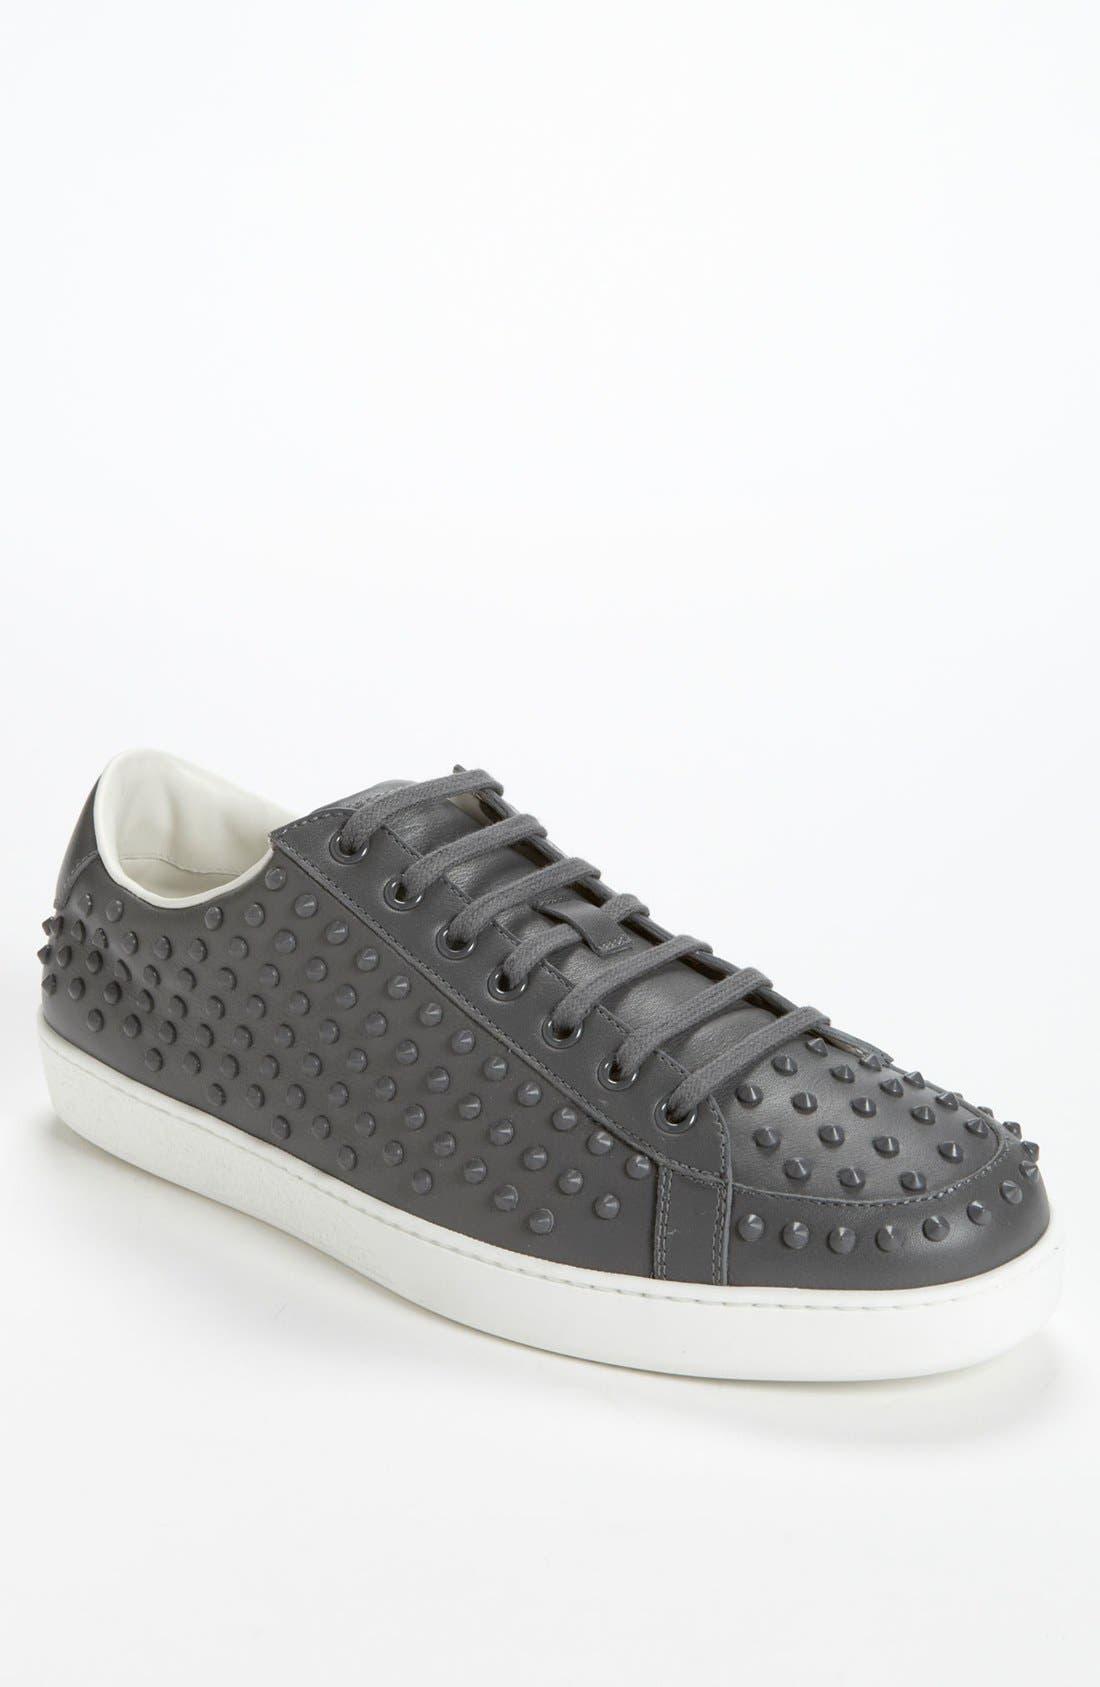 Alternate Image 1 Selected - Gucci 'Brooklyn' Sneaker